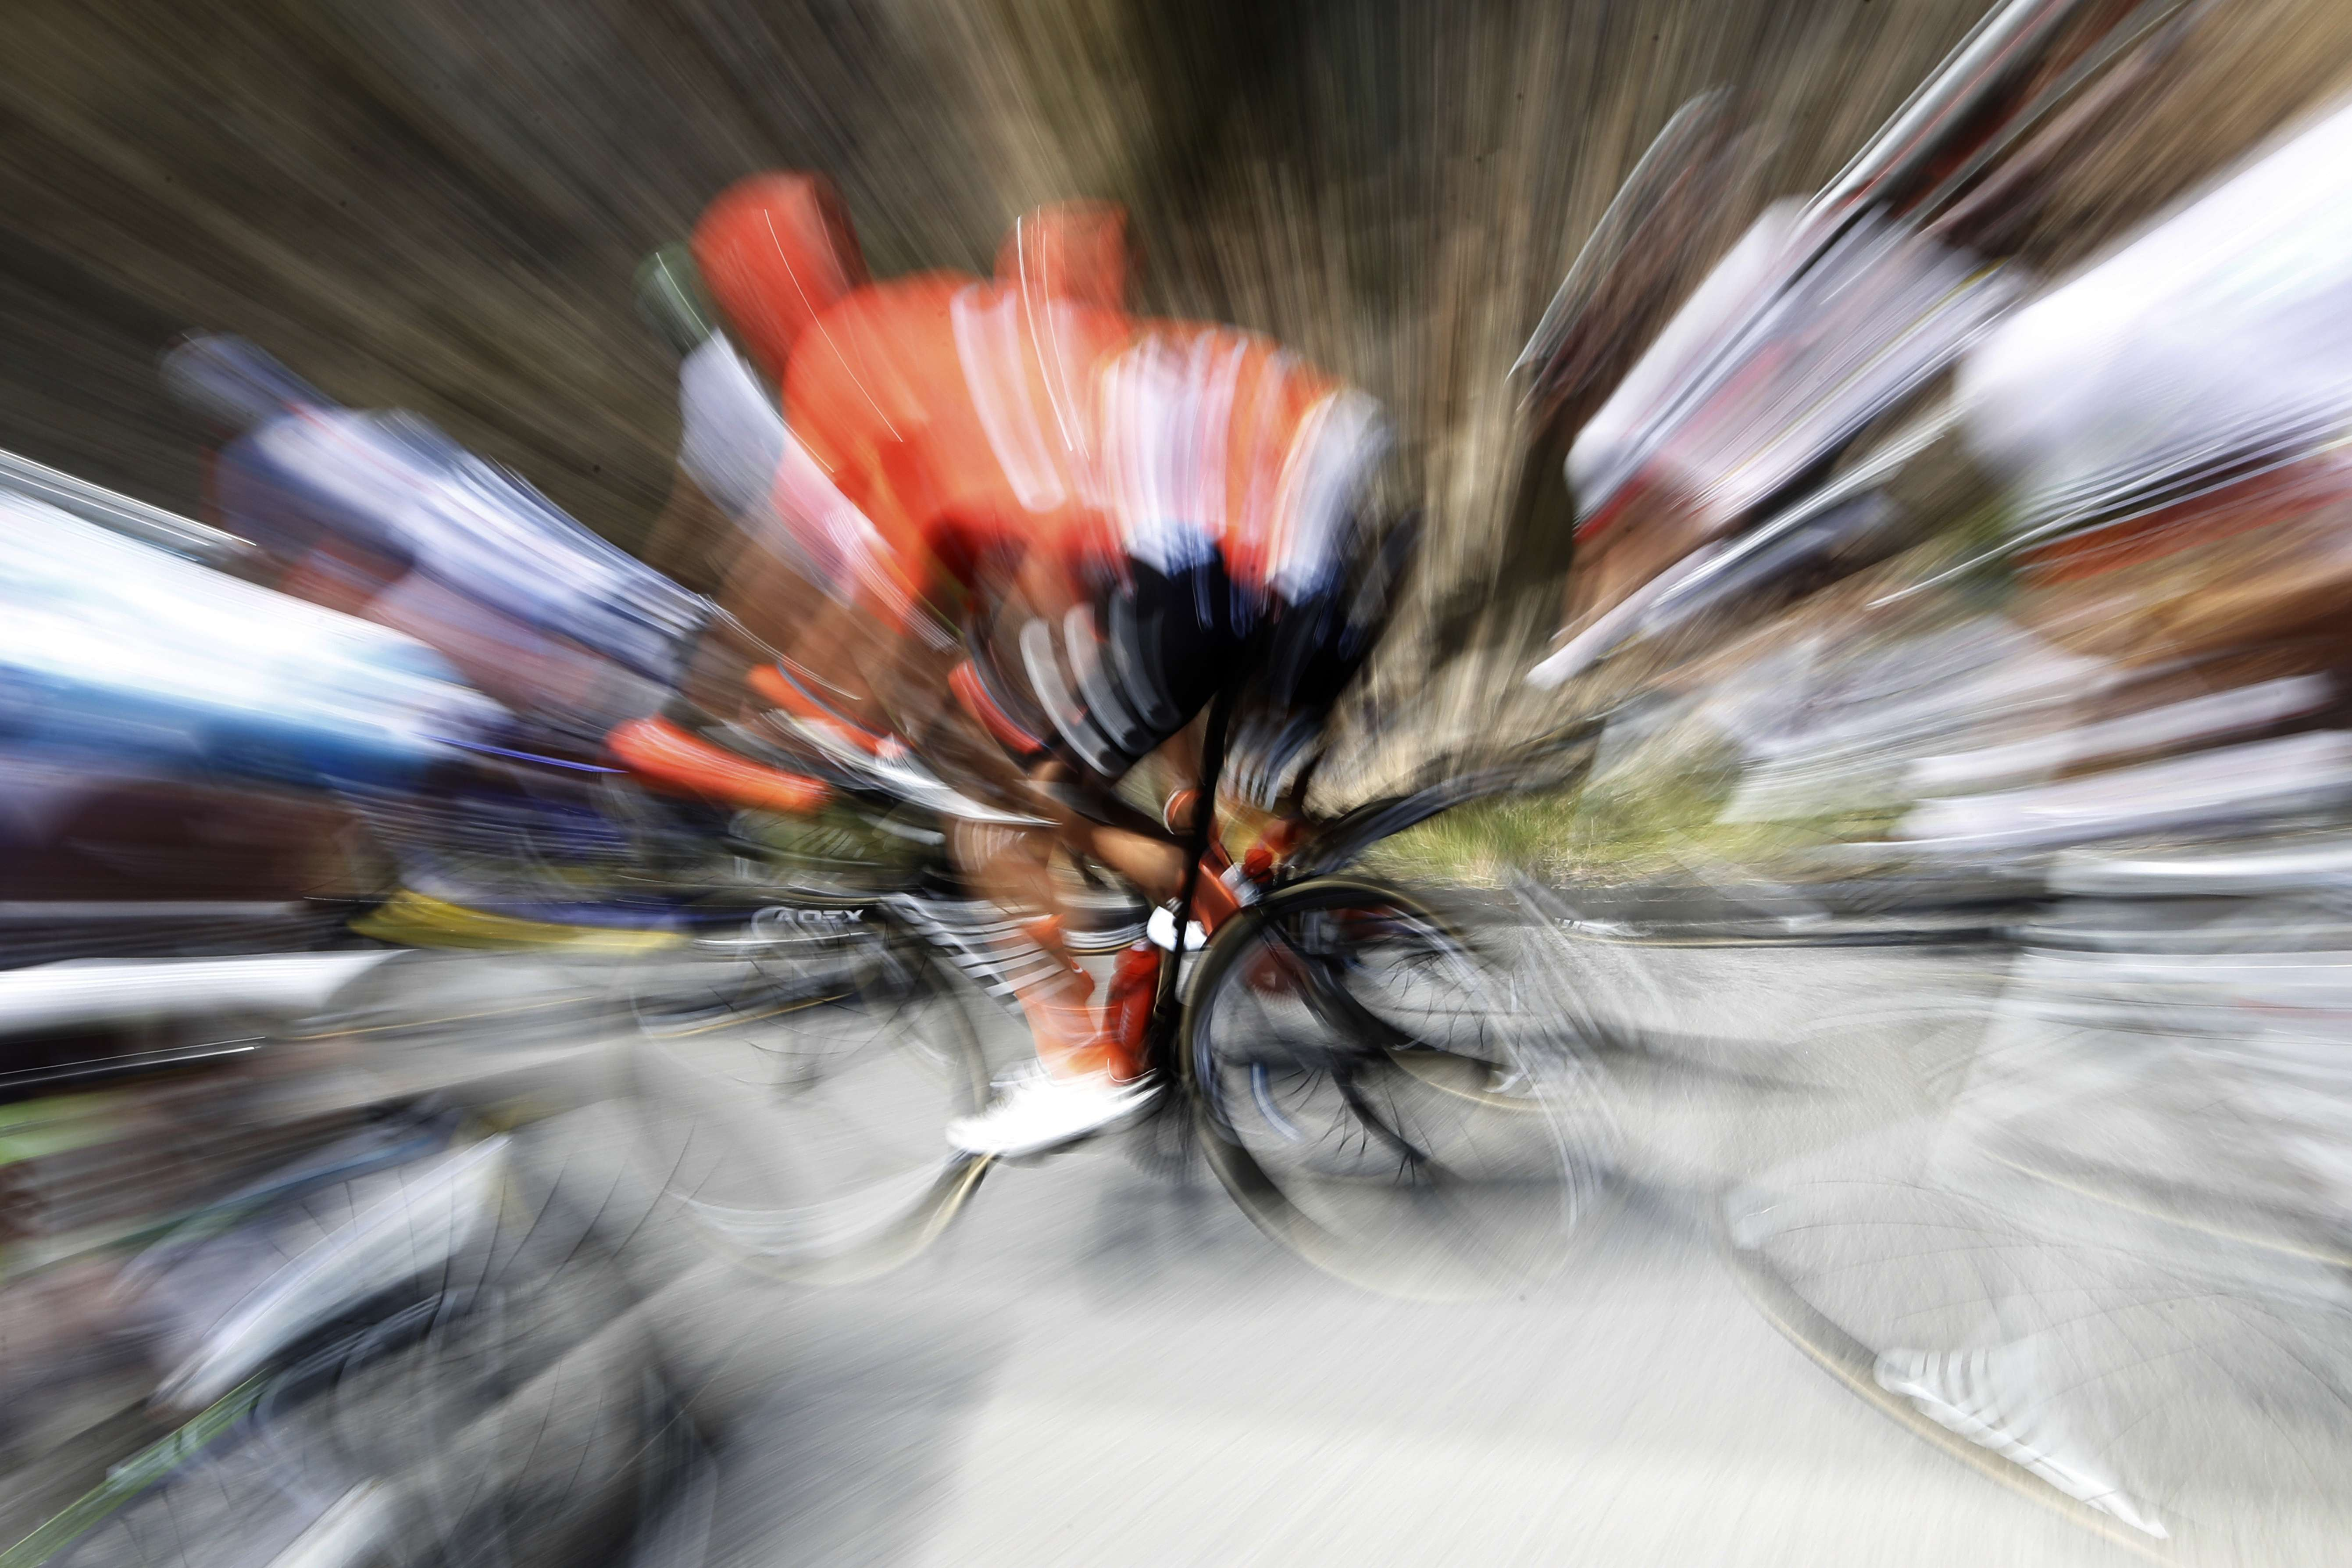 Tecnología resta romanticismo al Tour de Francia